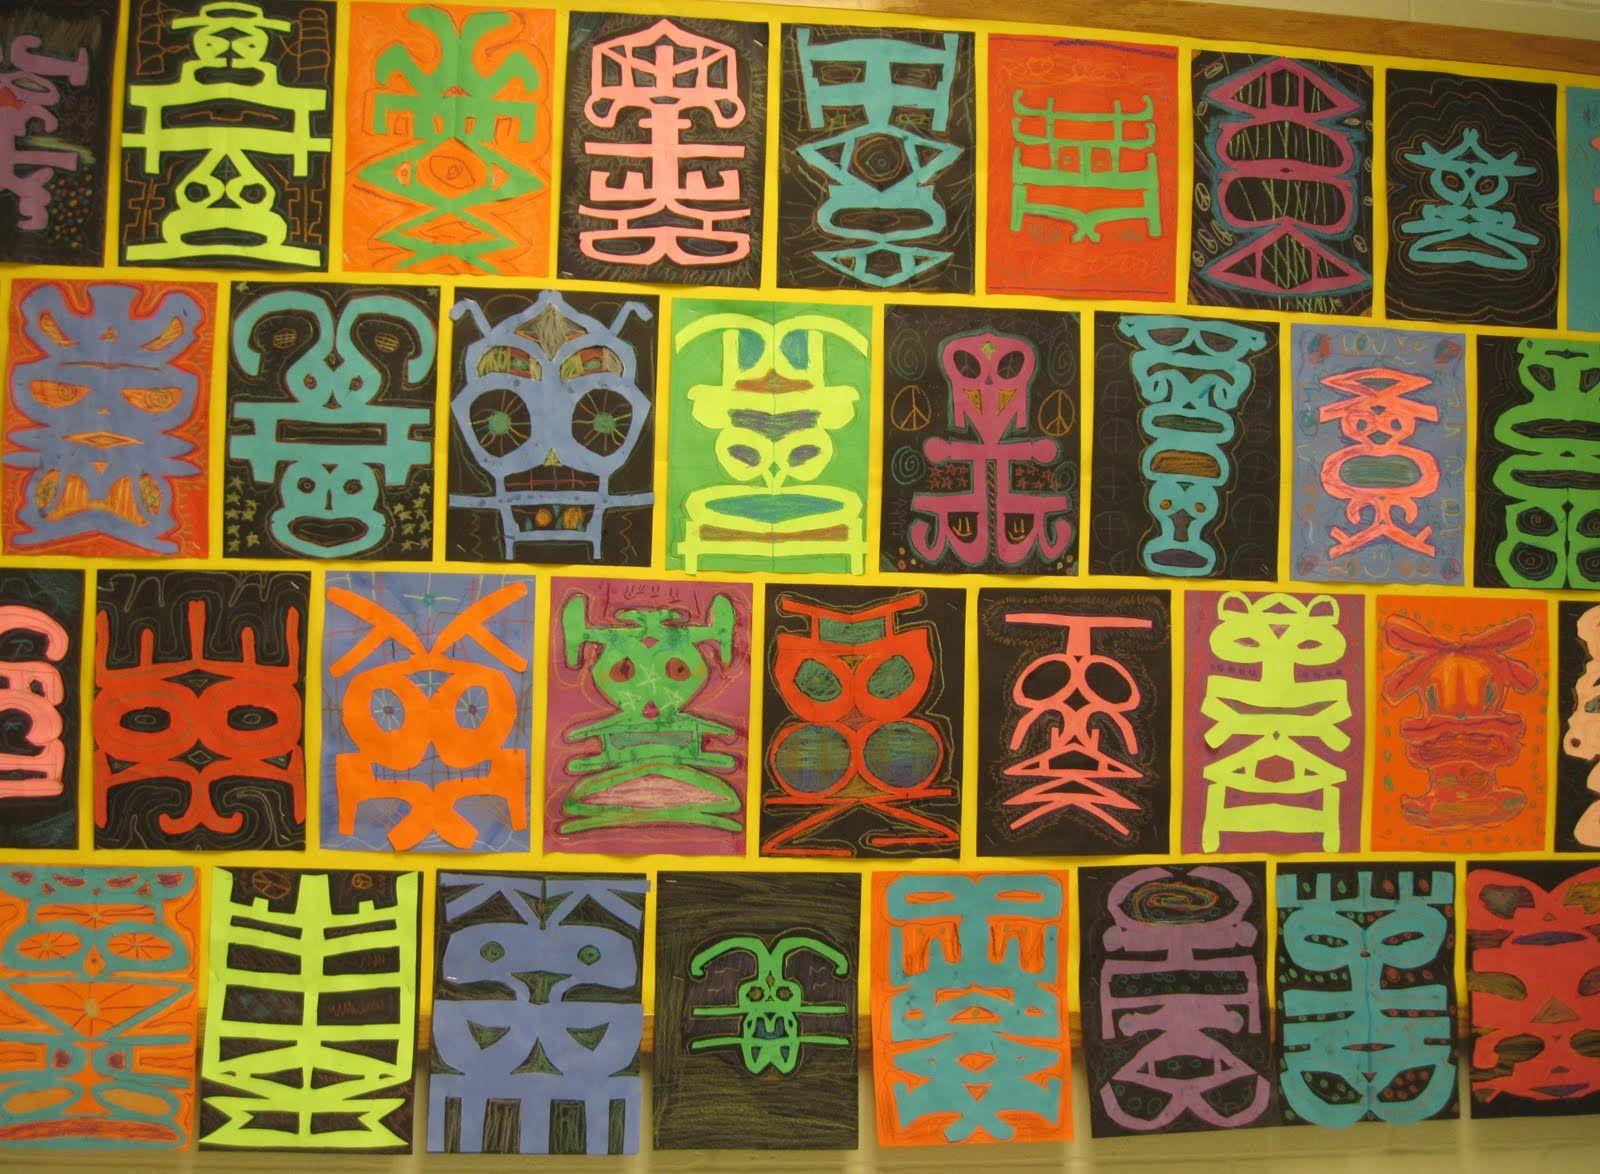 Workbooks symmetry worksheets for high school : 5th grade symmetrical name design | Lesson Ideas | Pinterest ...